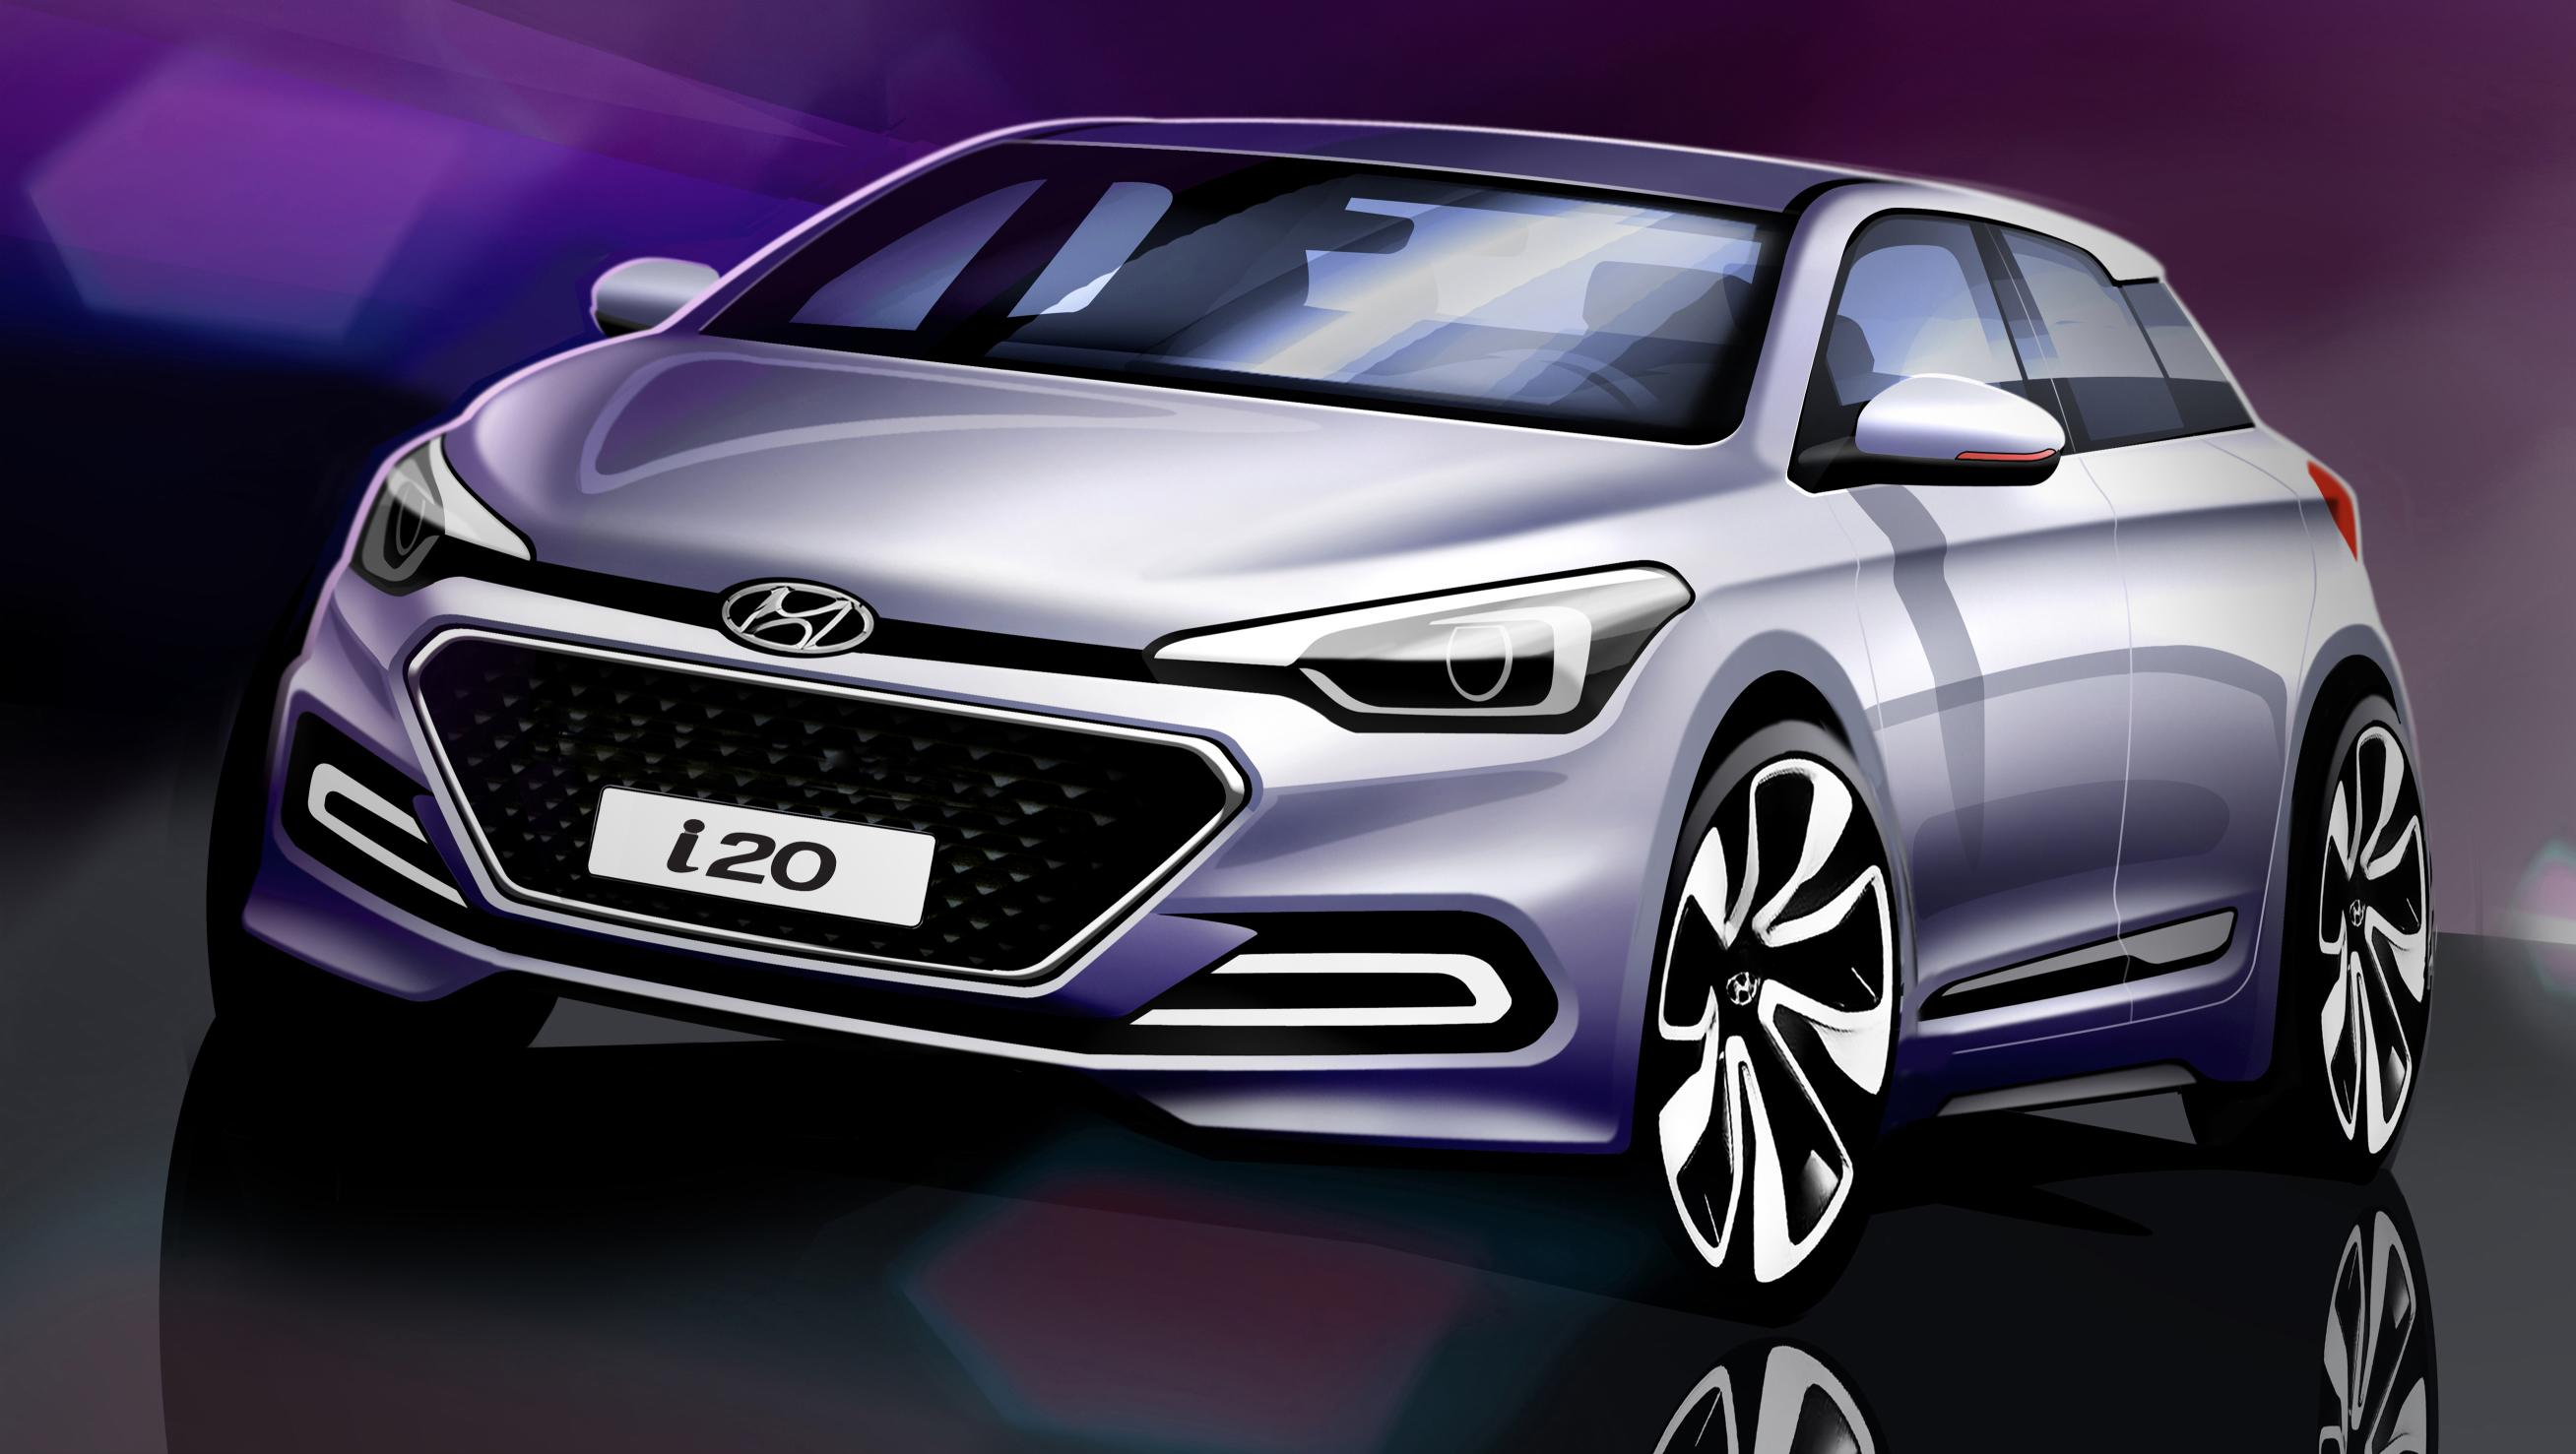 Hyundai i20 New Generation Design | Latest News | Surf4cars